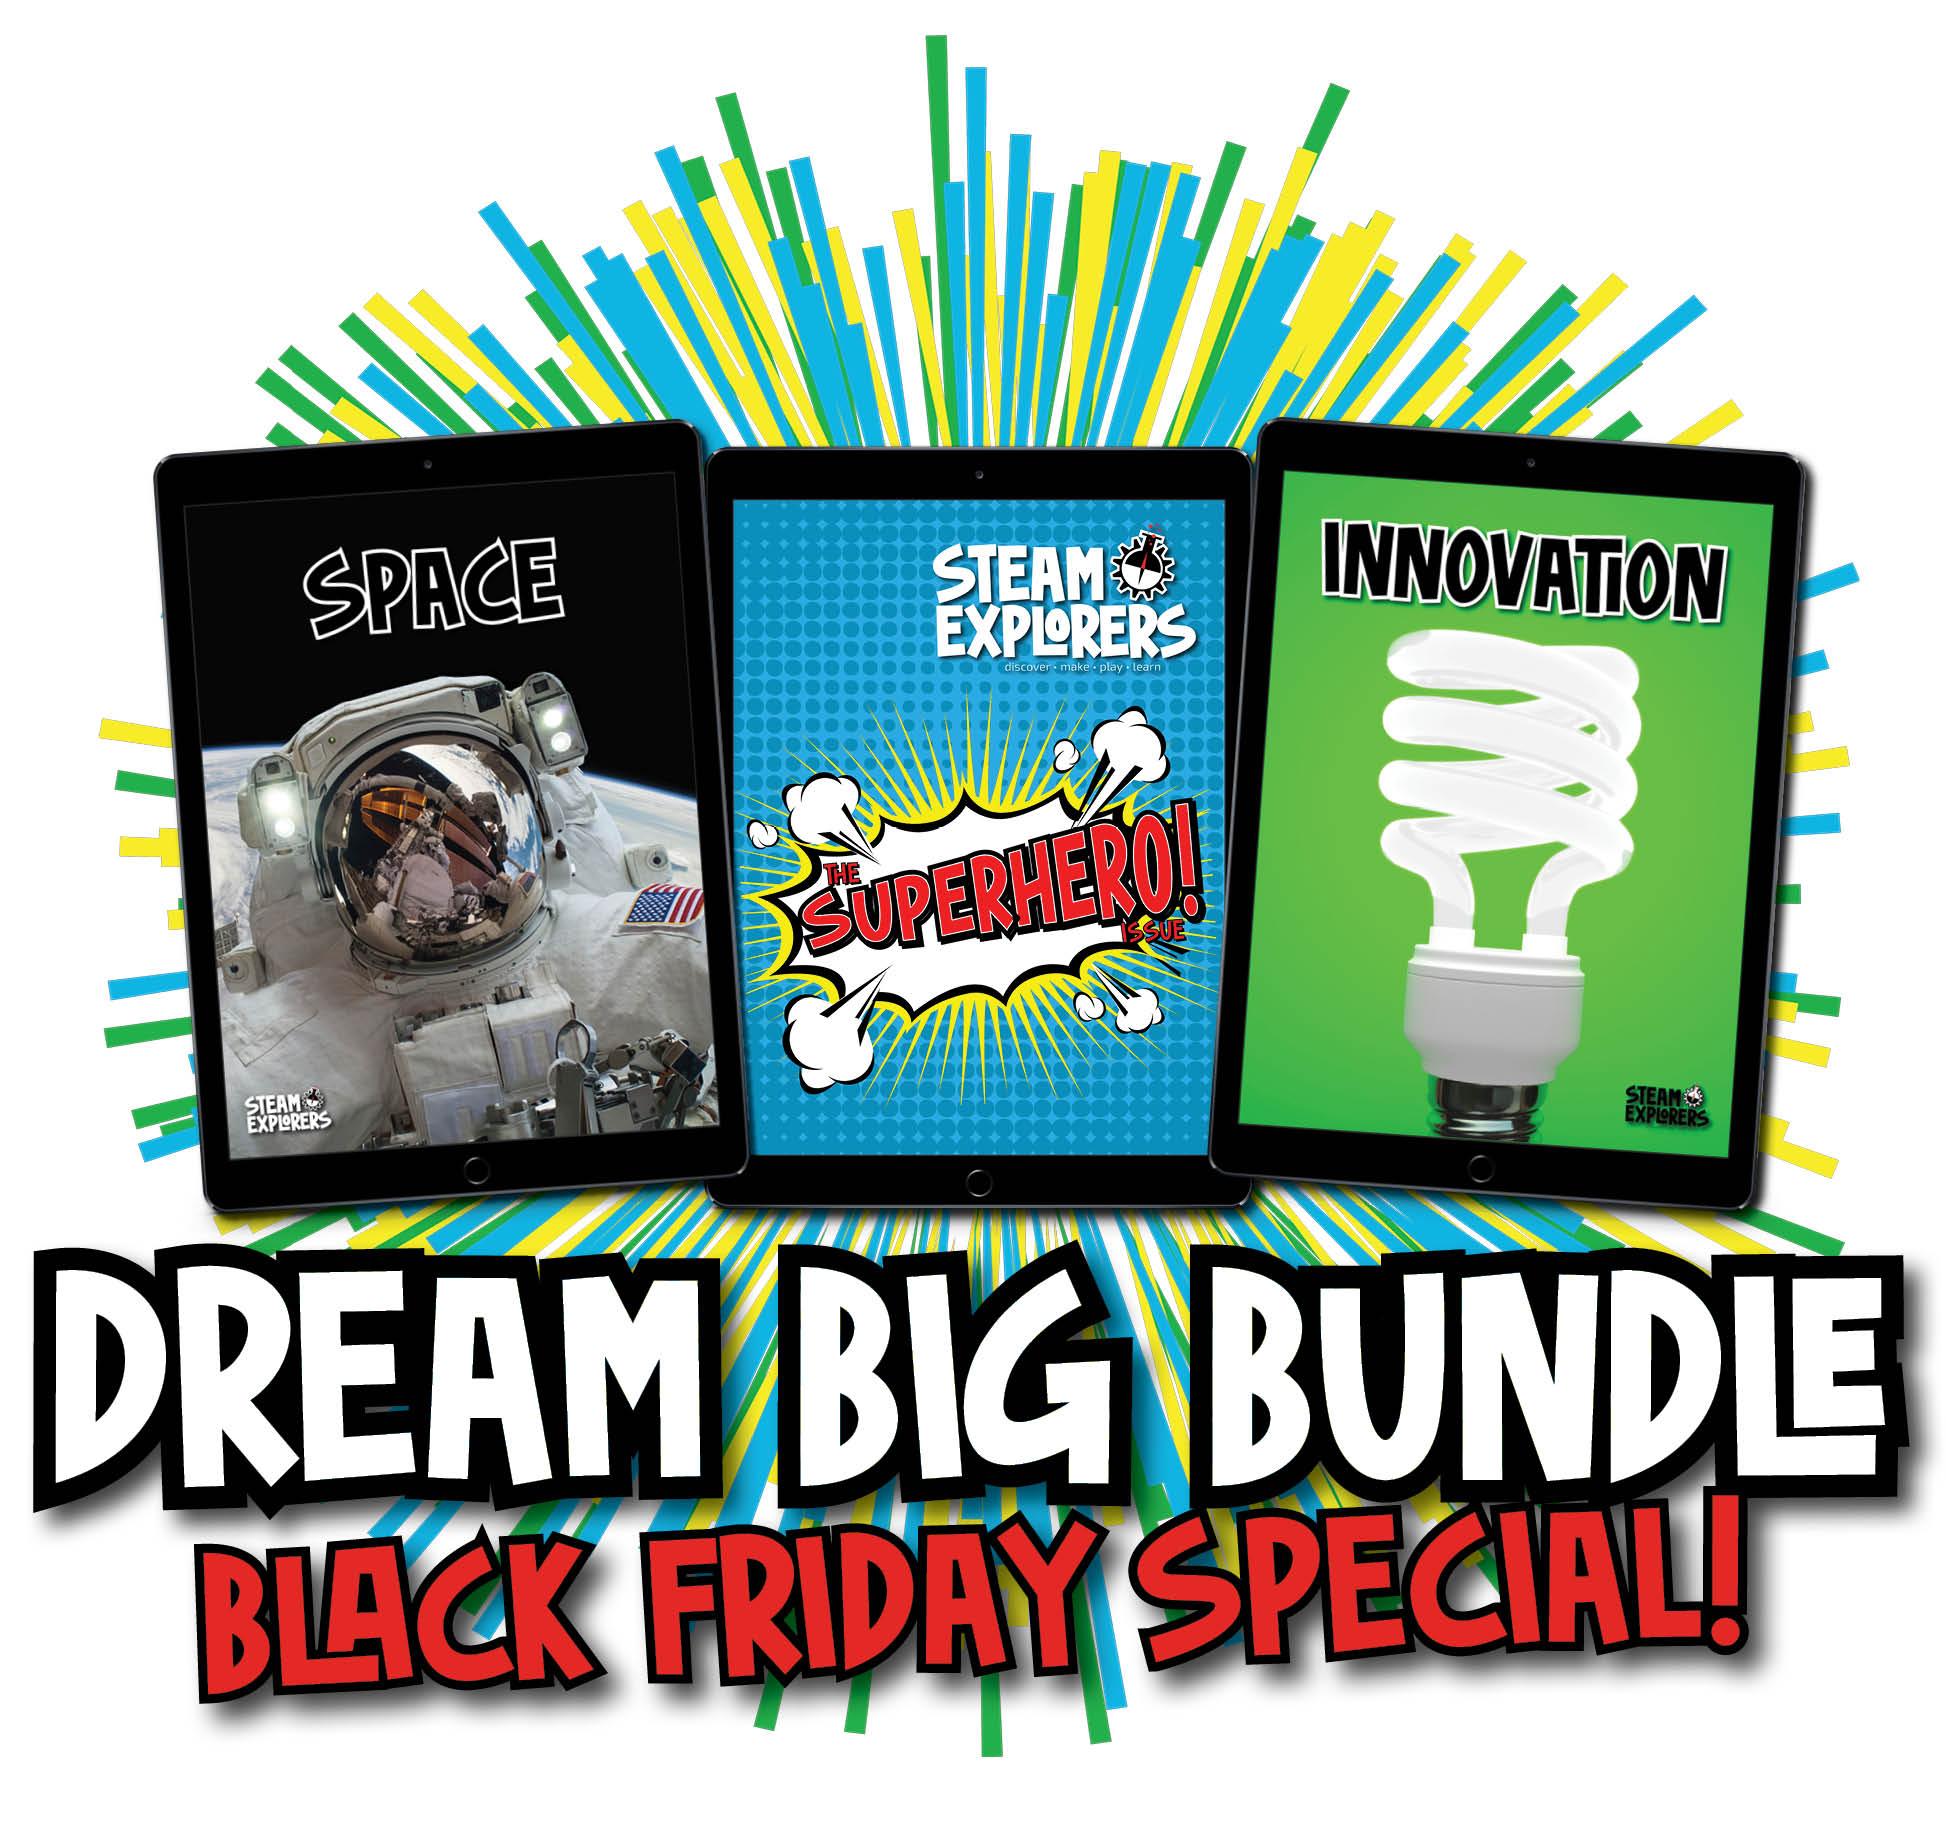 Dream Big Bundle Covers Explosion Black Friday Special horizontal